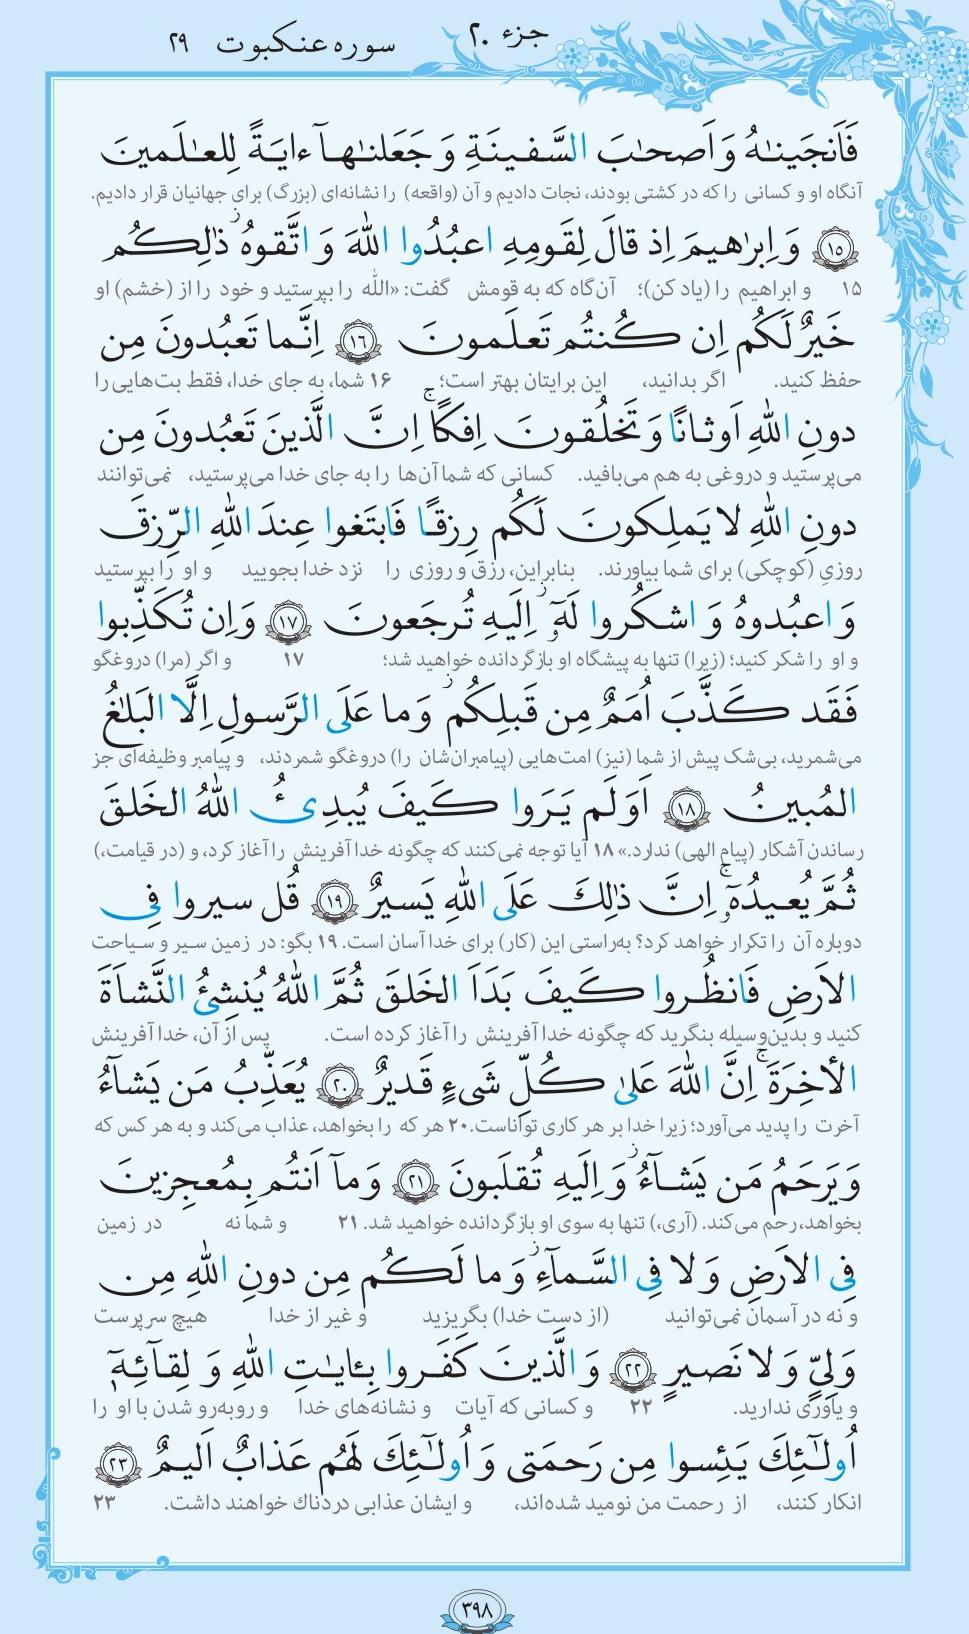 13990331000805 Test NewPhotoFree - ترتیل صفحه ۳۹۸ قرآن باصدای خلیل الحصری+صوت و متن